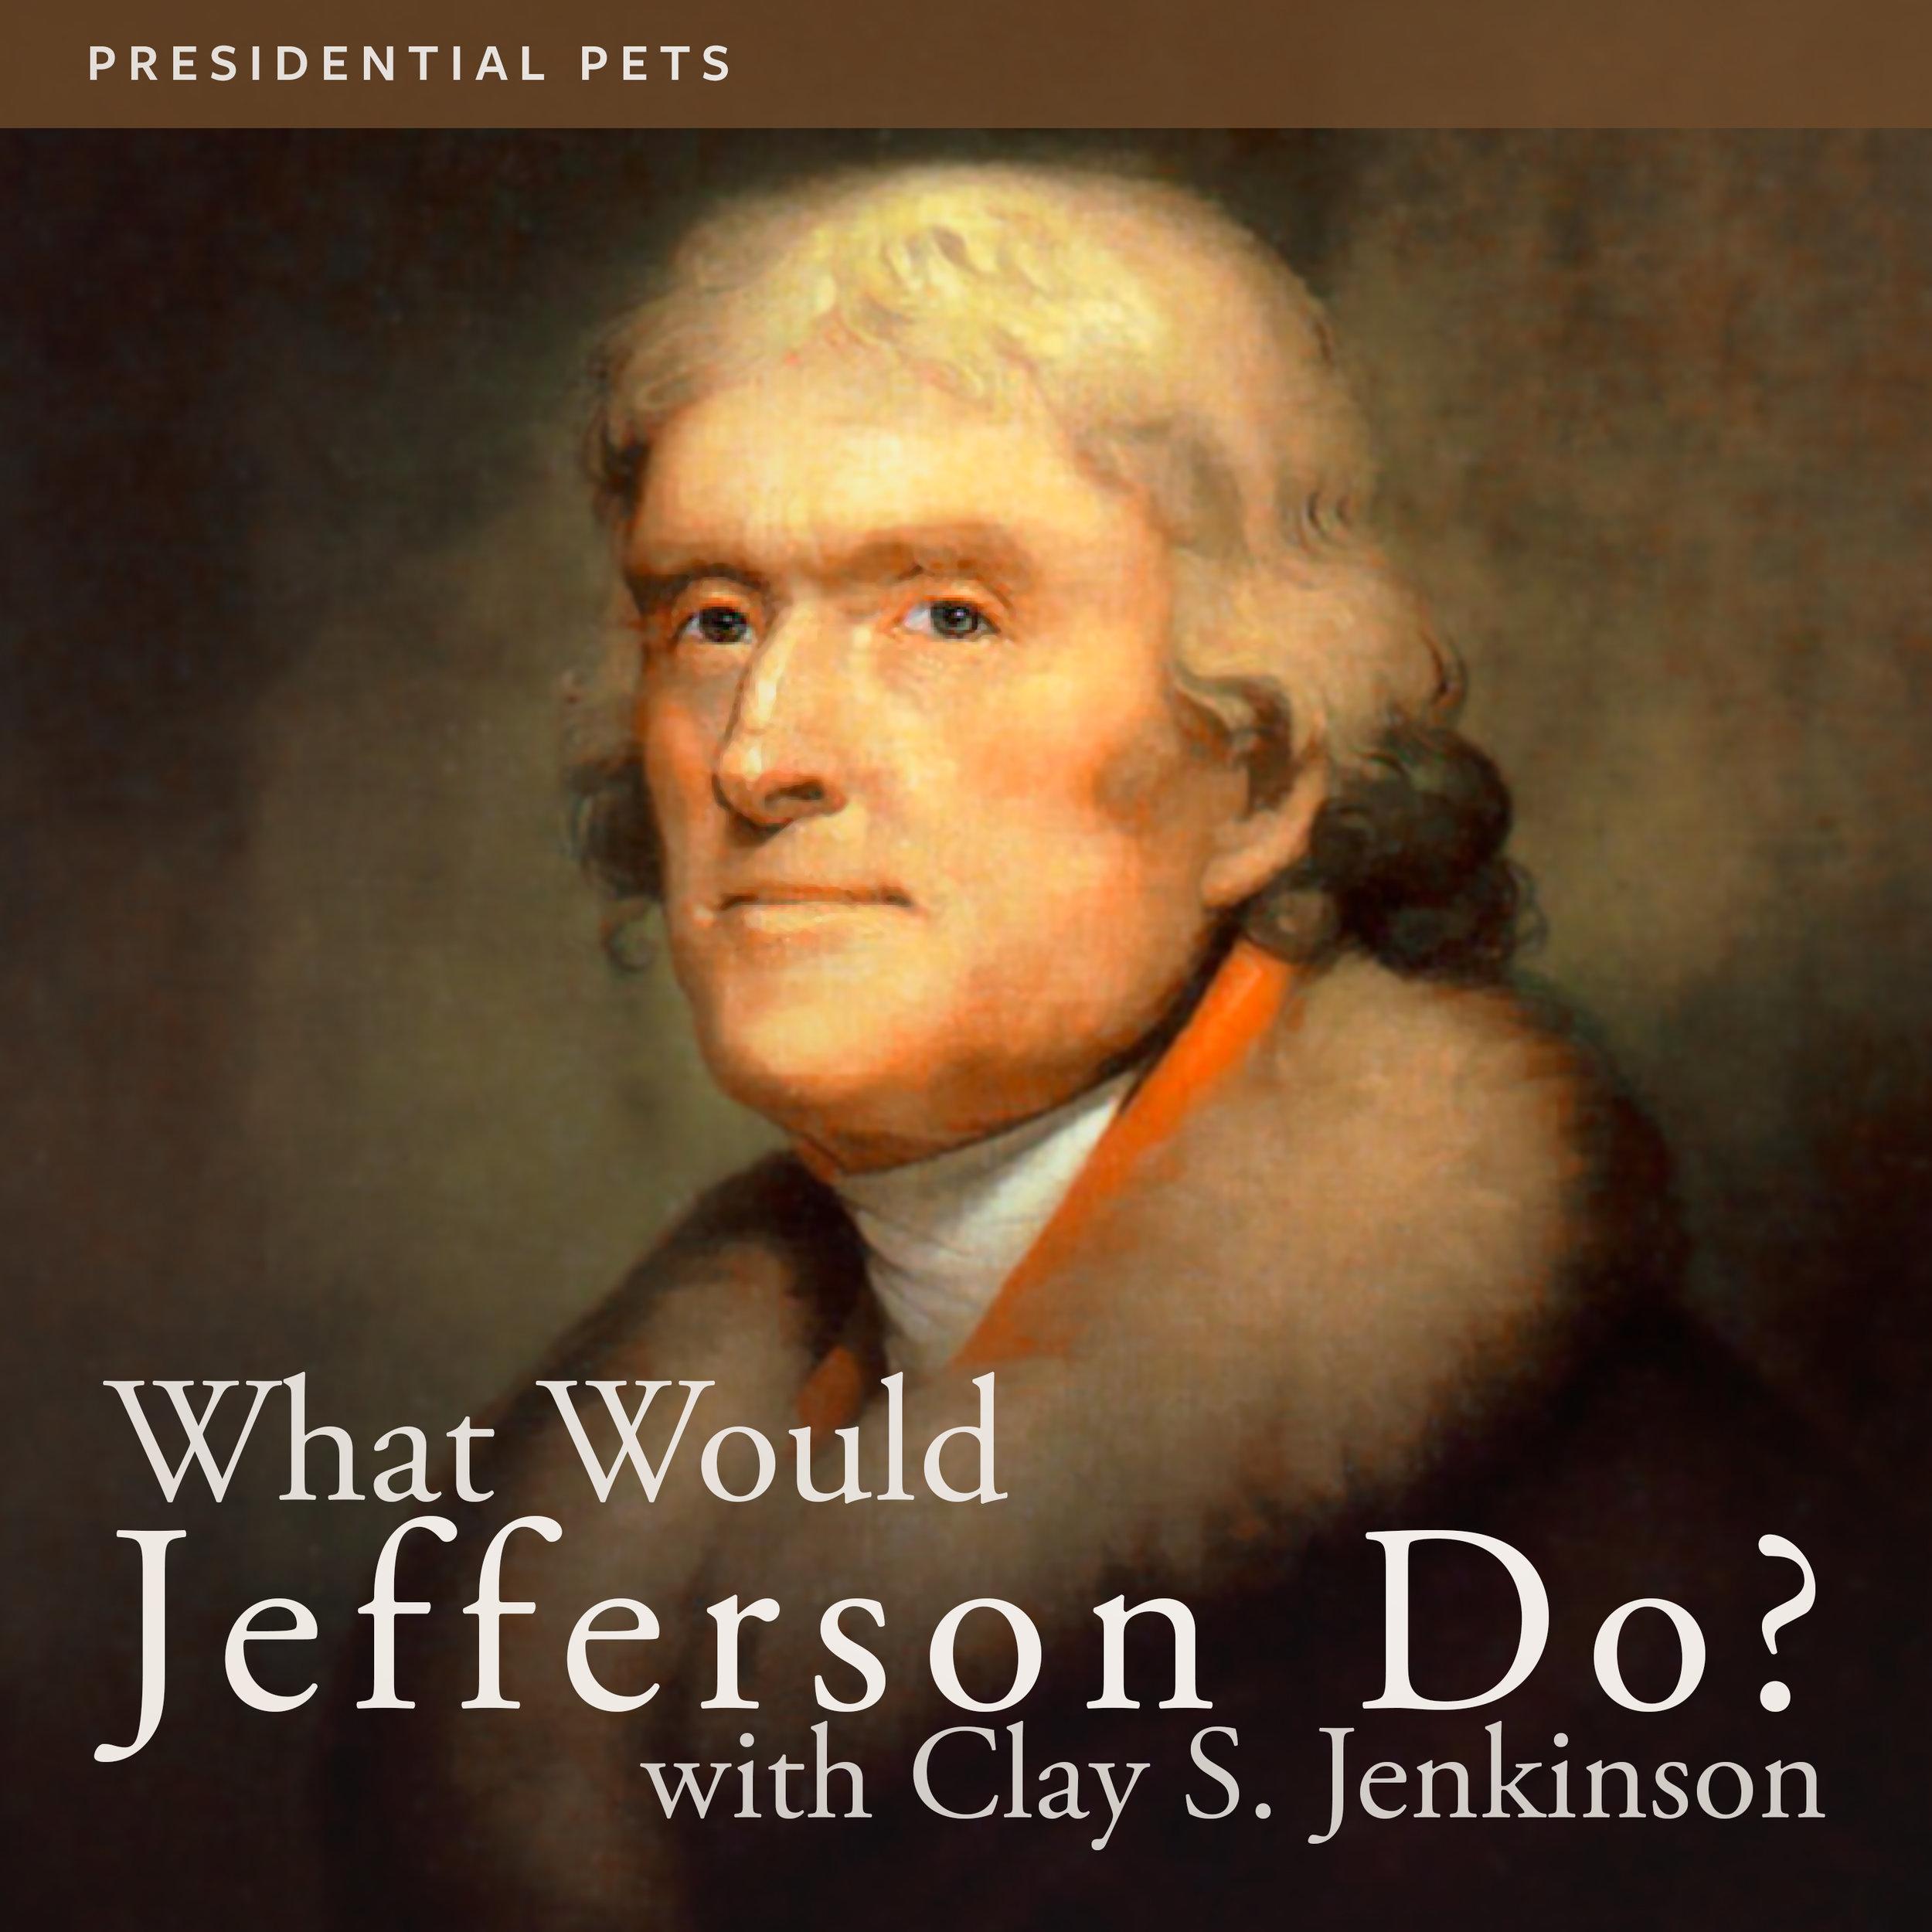 WWTJD_1326 Presidential Pets.jpg